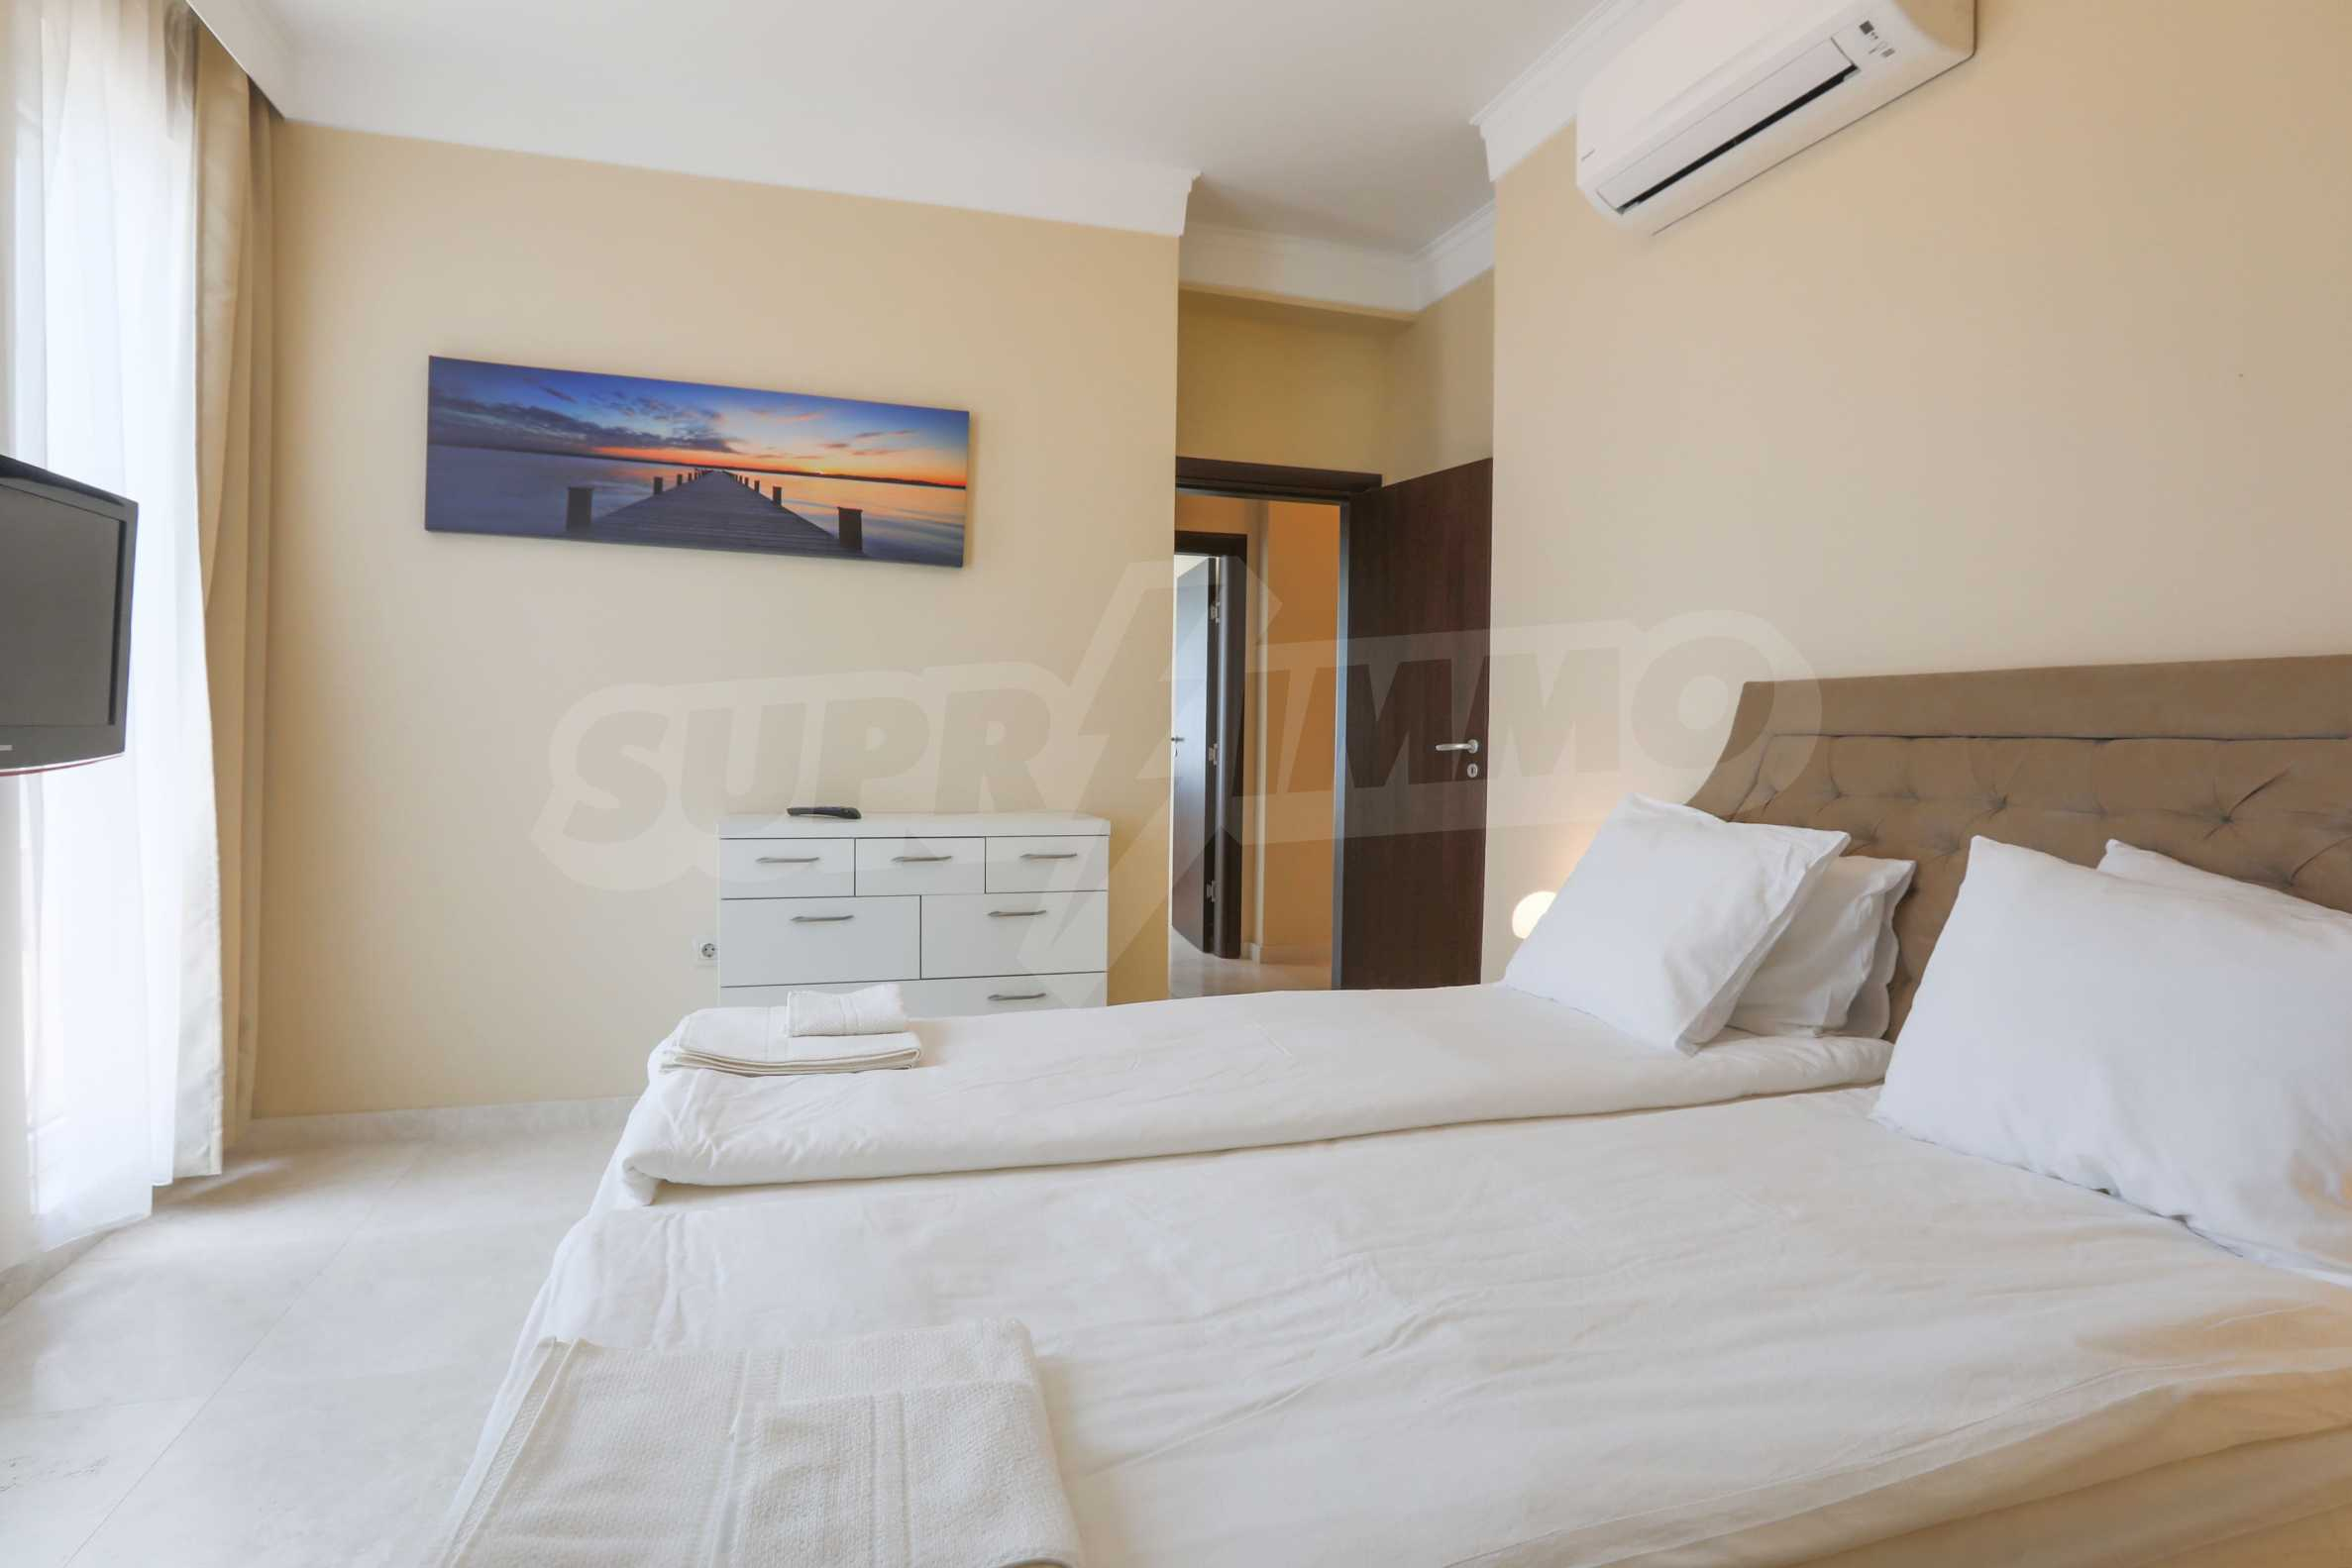 Комфортен двустаен апартамент под наем в Belle Époque Beach Residence, курорт Лозенец 13